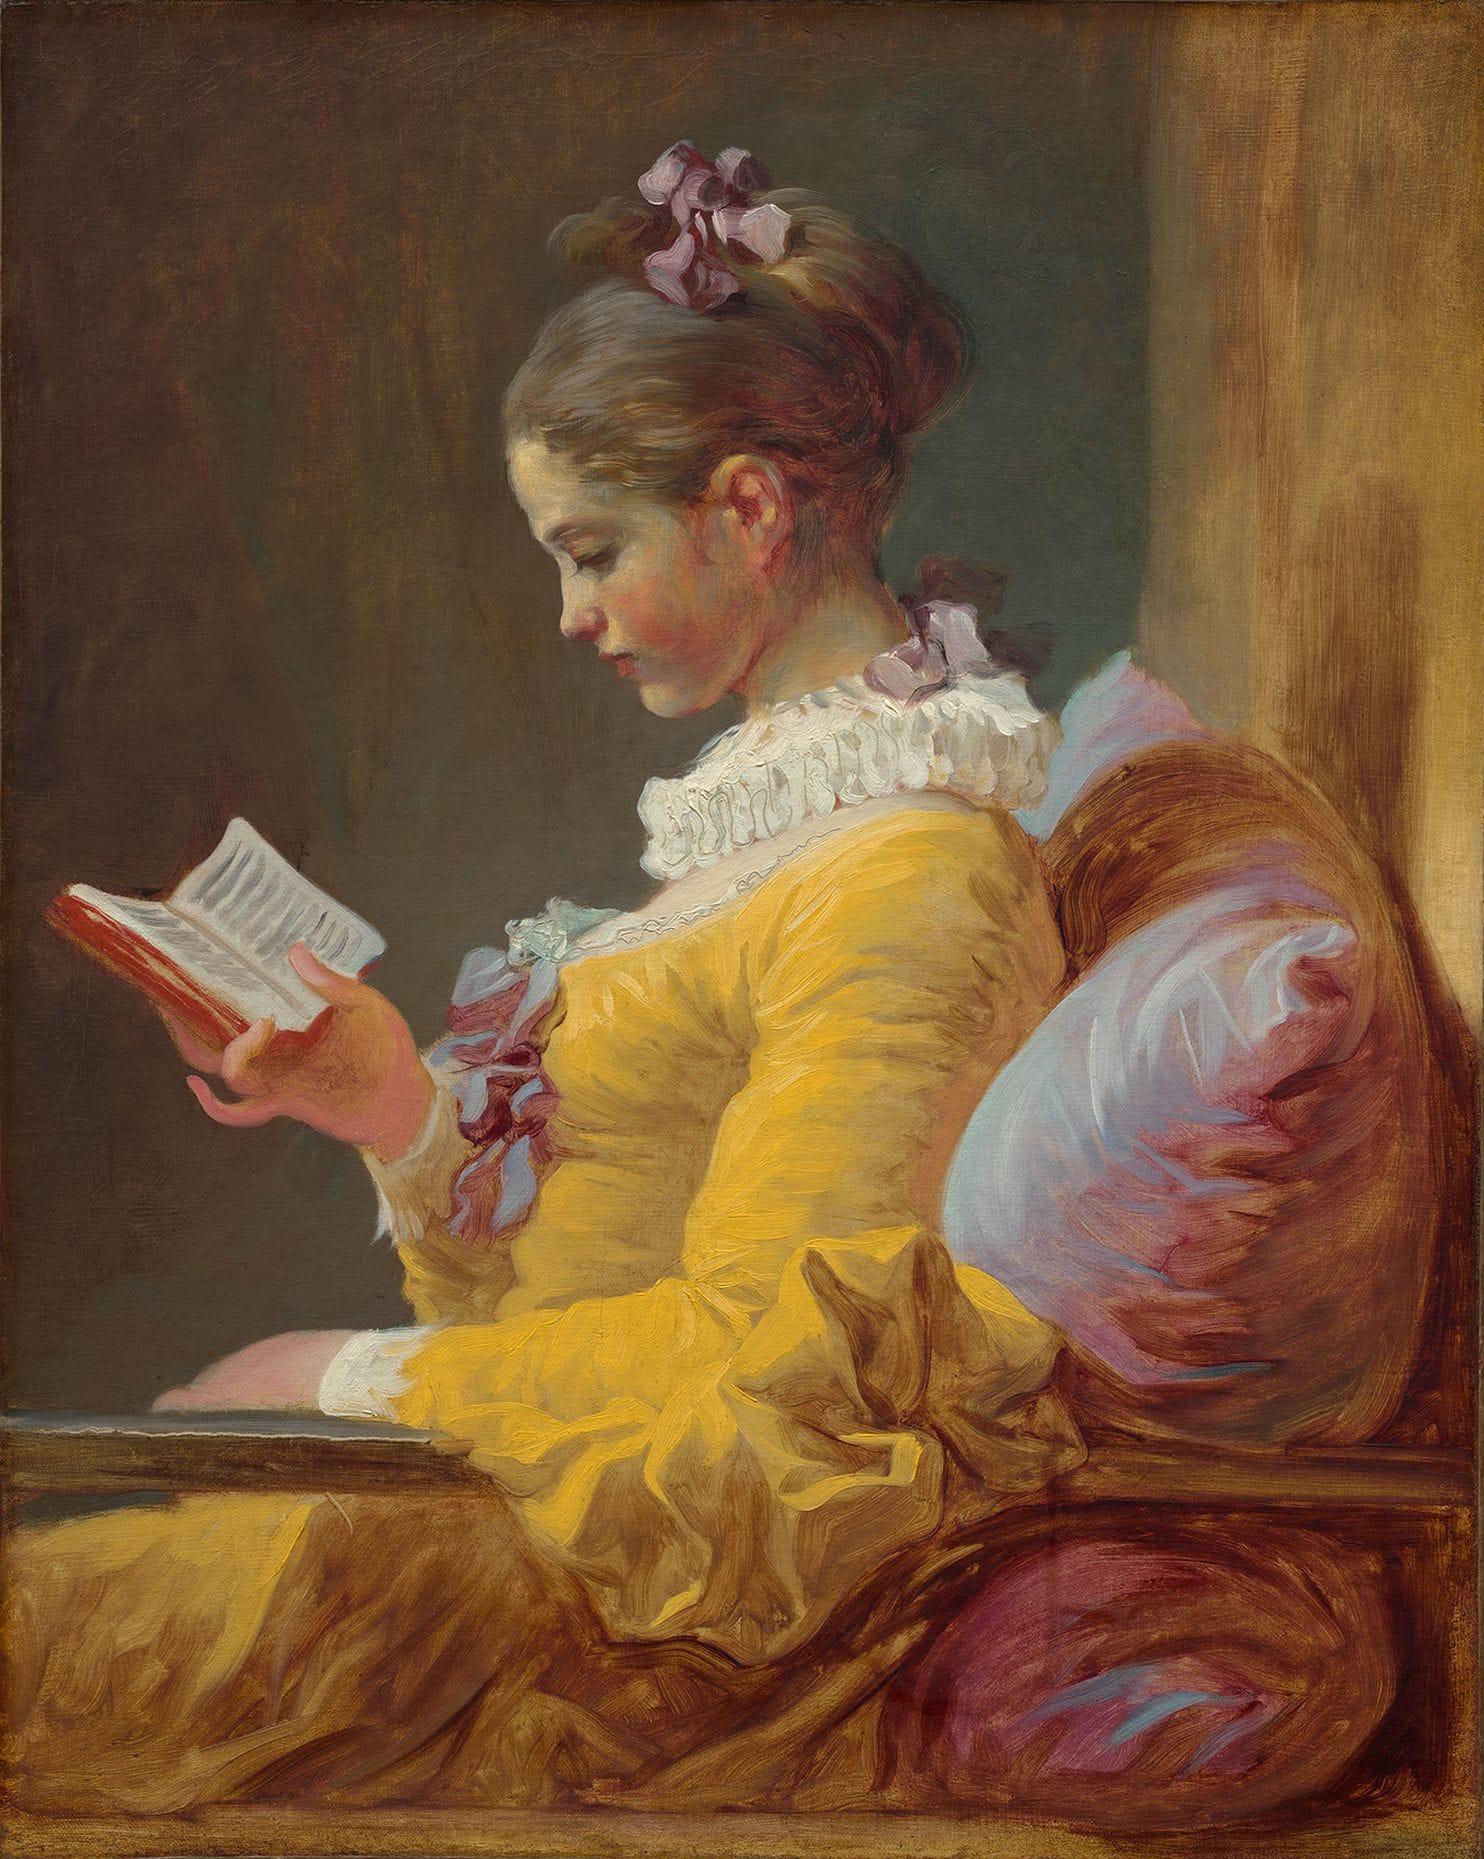 Jean Honoré Fragonard - Giovane donna che legge